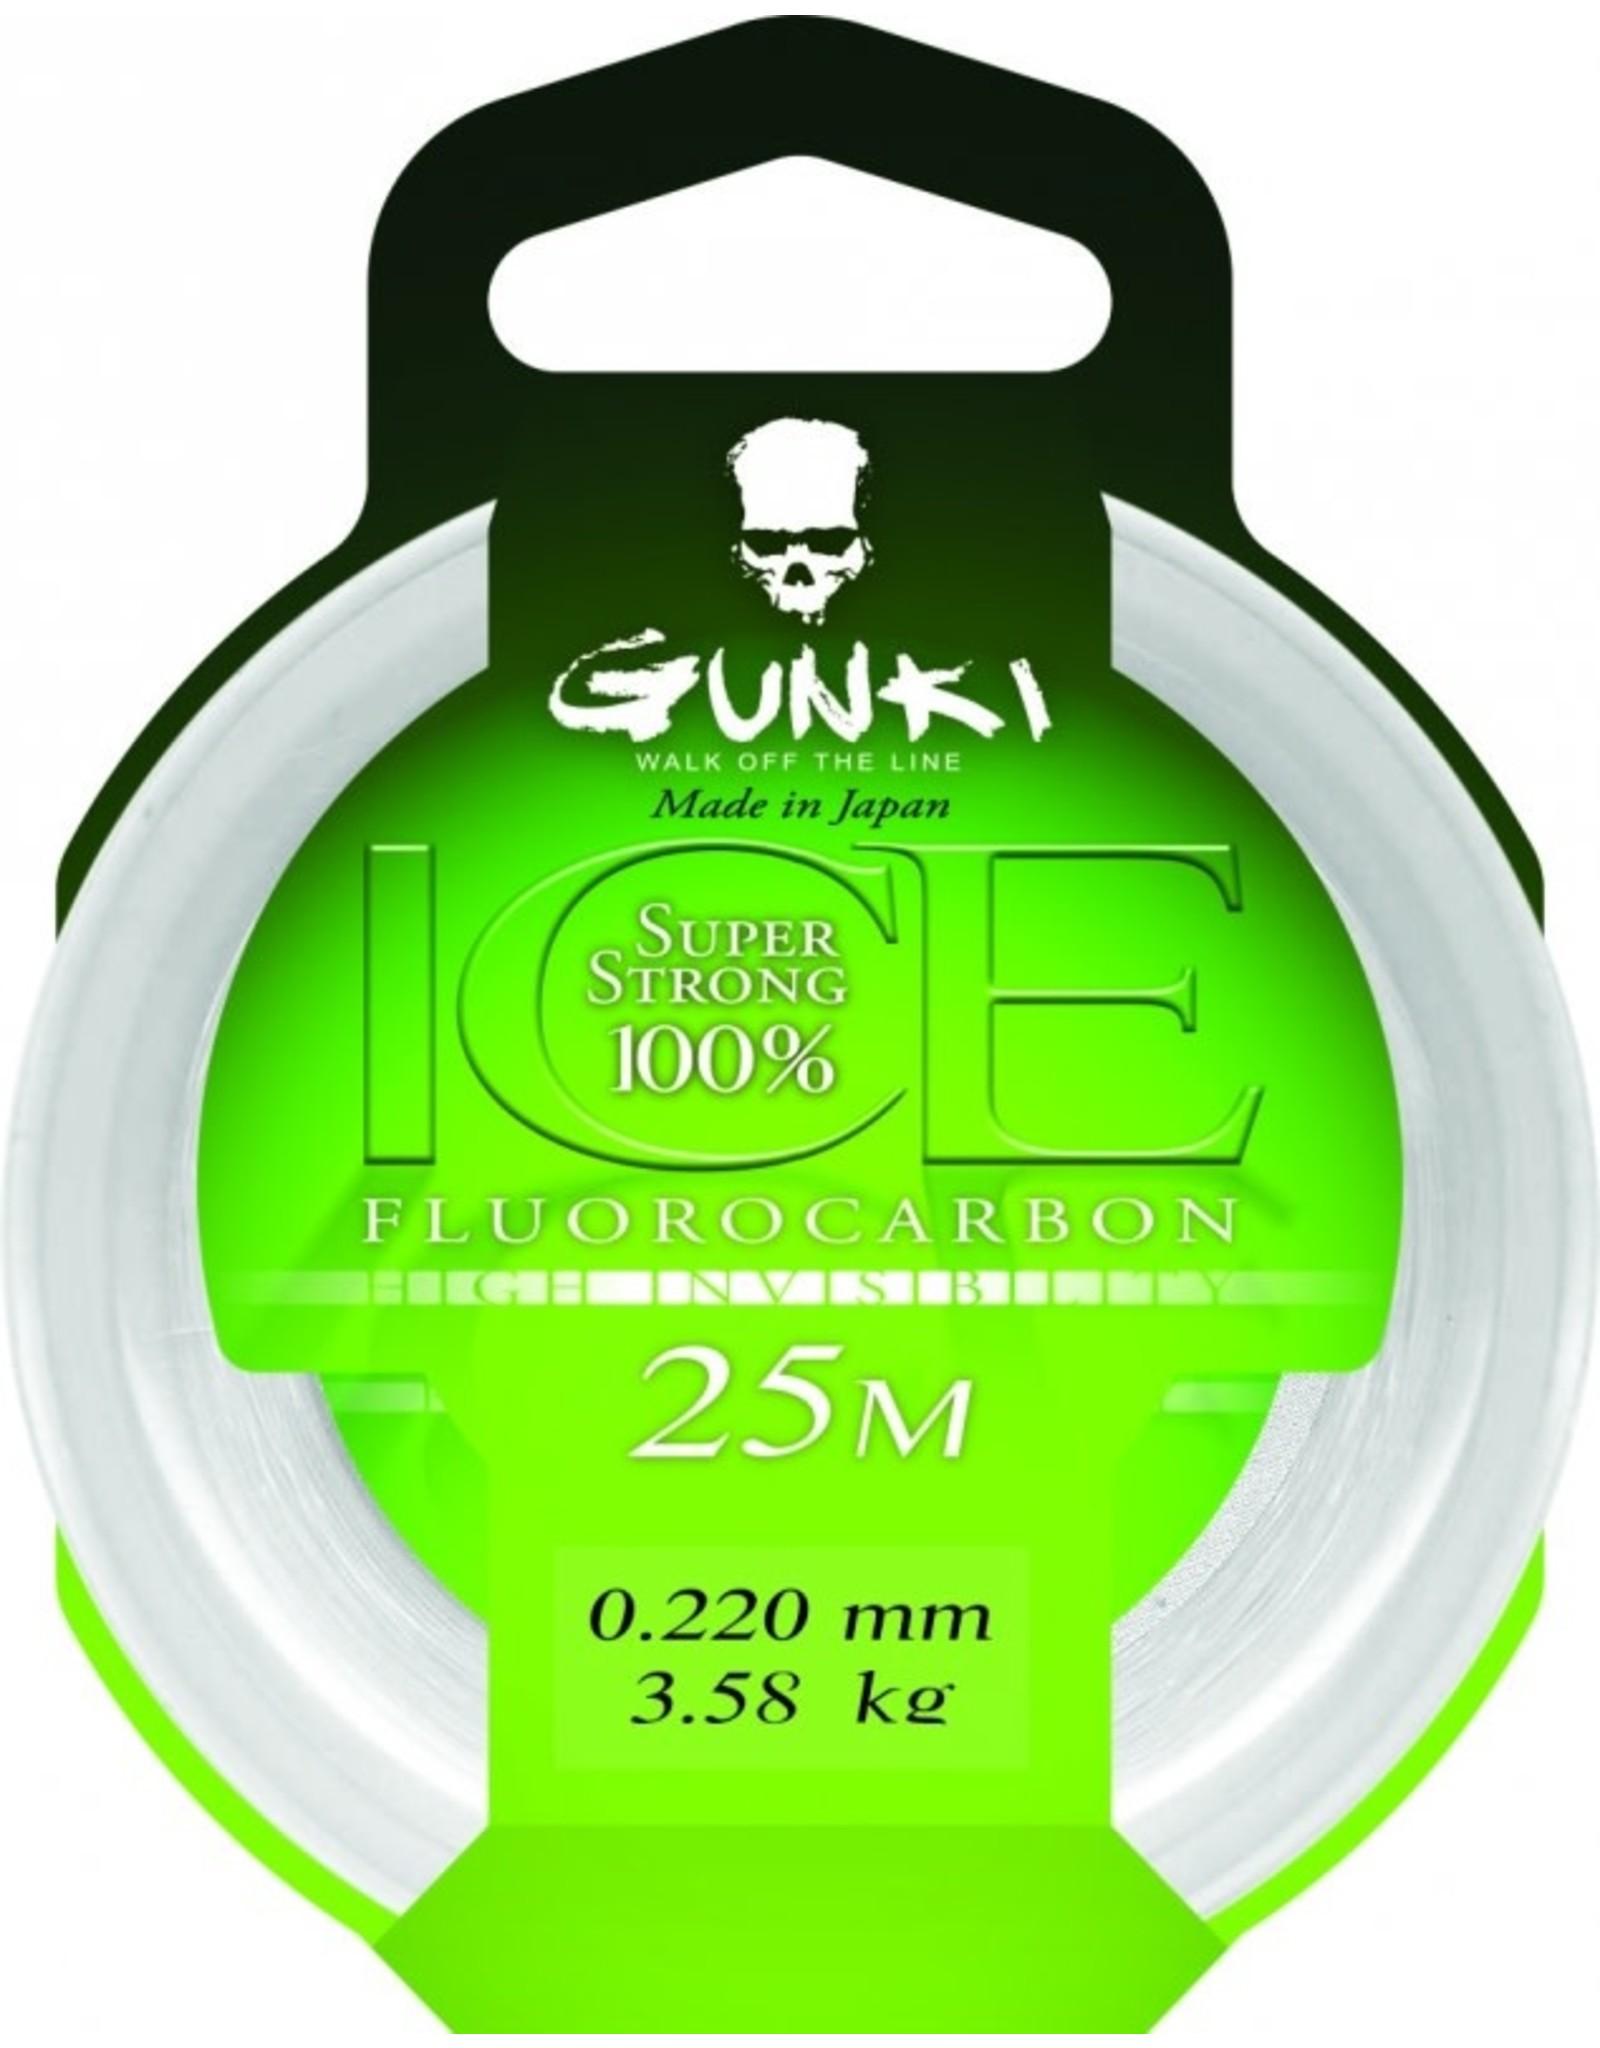 GUNKI FLUOROCARBON ICE 0,29